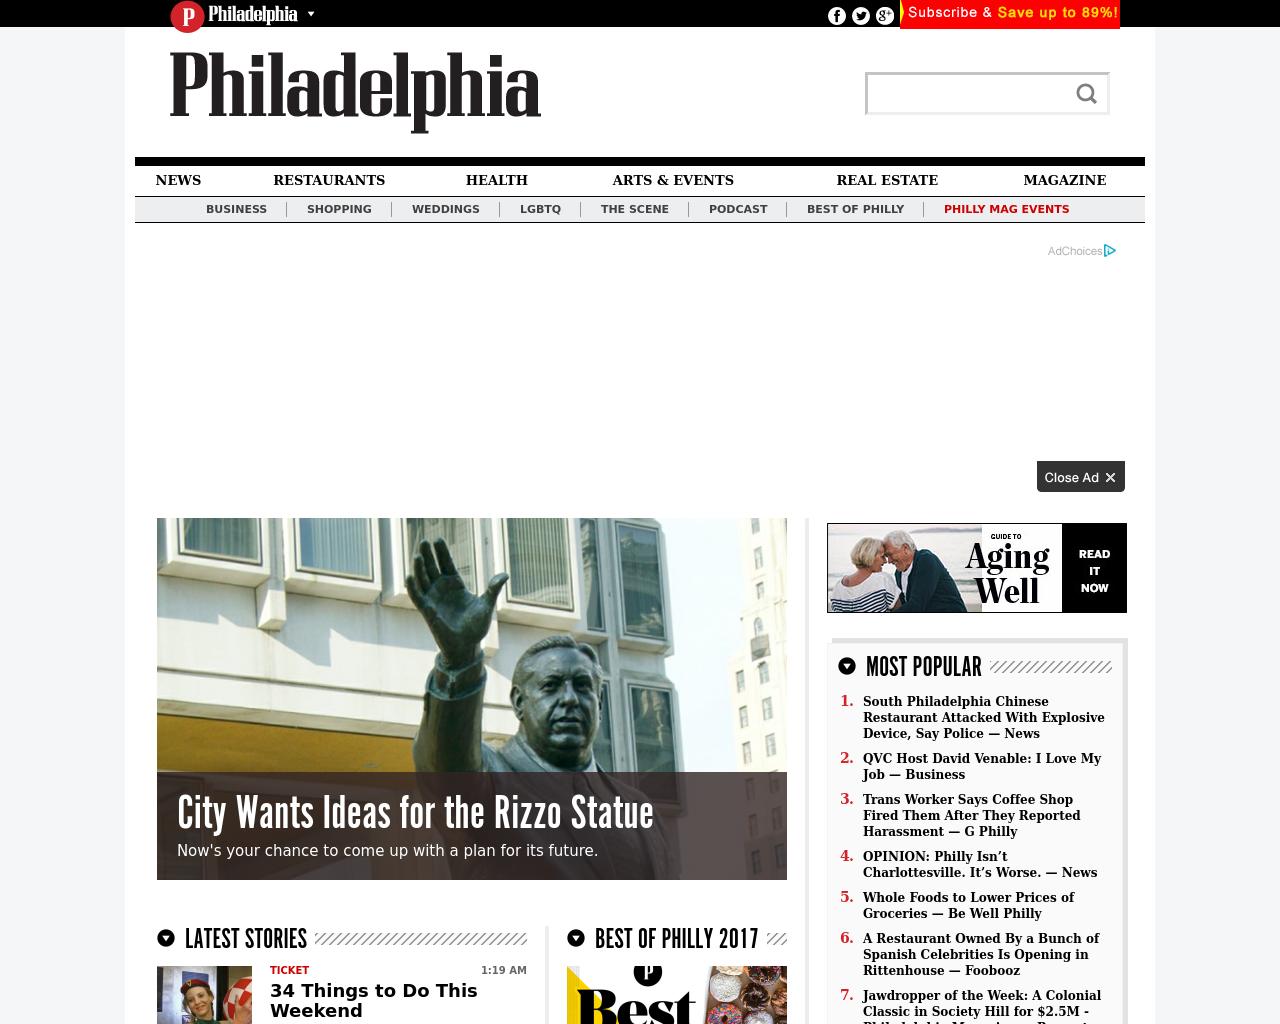 Philadelphia-Magazine-Advertising-Reviews-Pricing